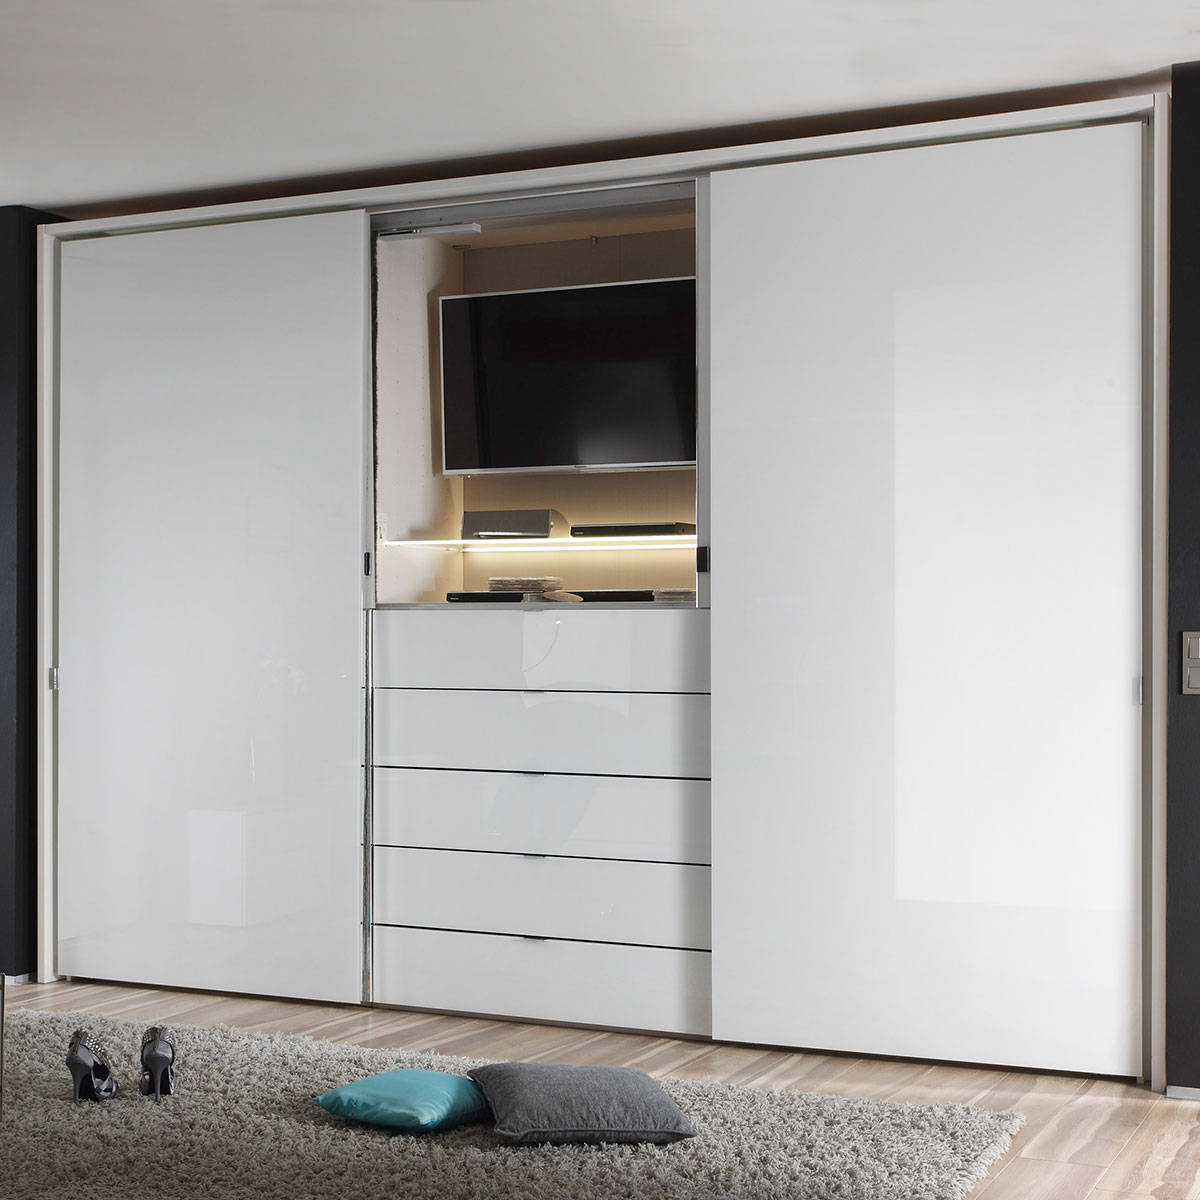 schwebet rnschrank media in wei mit beleuchtung flamme. Black Bedroom Furniture Sets. Home Design Ideas